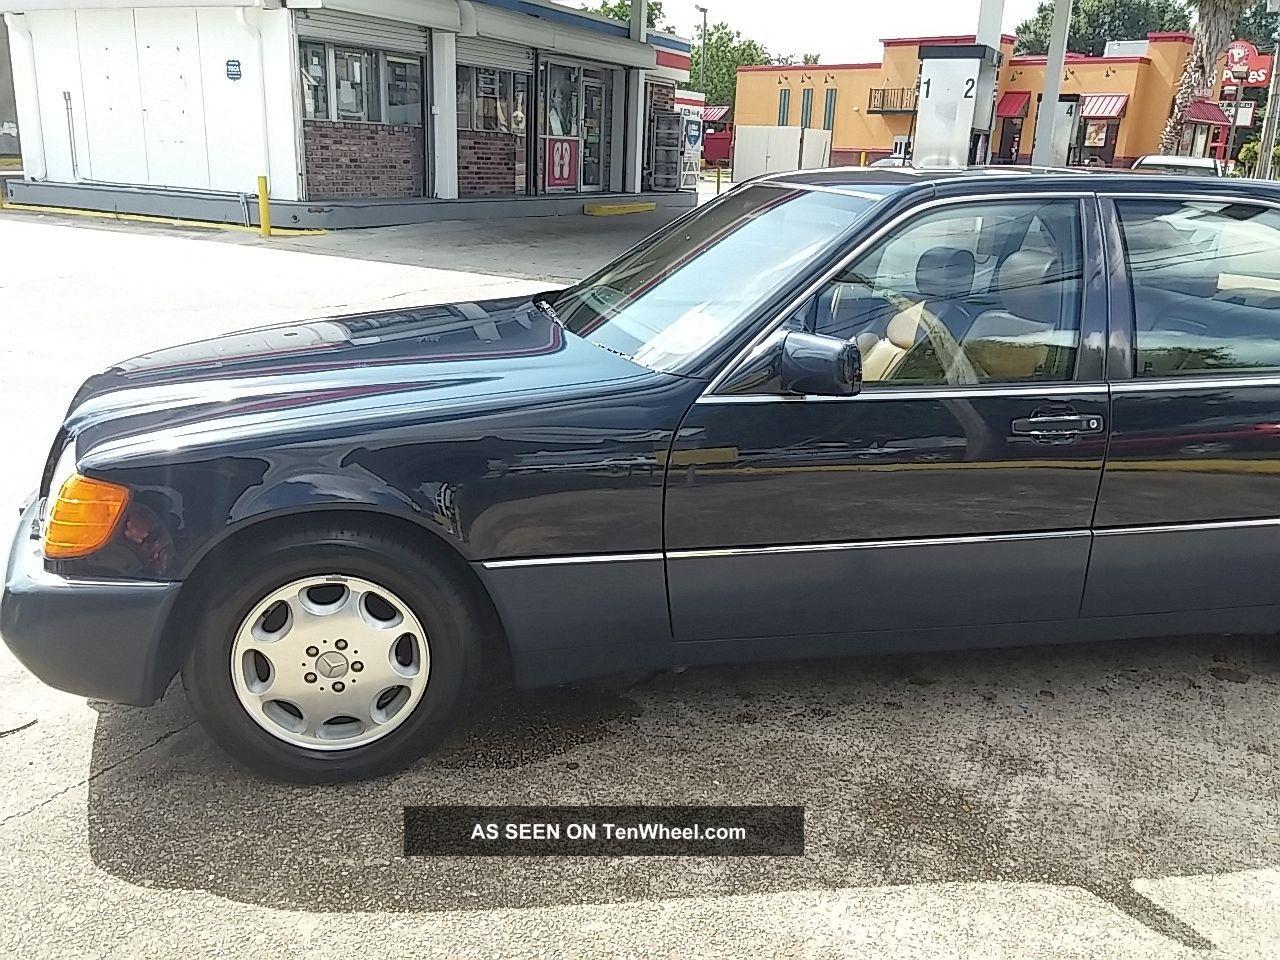 1994 mercedes benz s320 lwb sedan with mp3 jack for 1994 mercedes benz